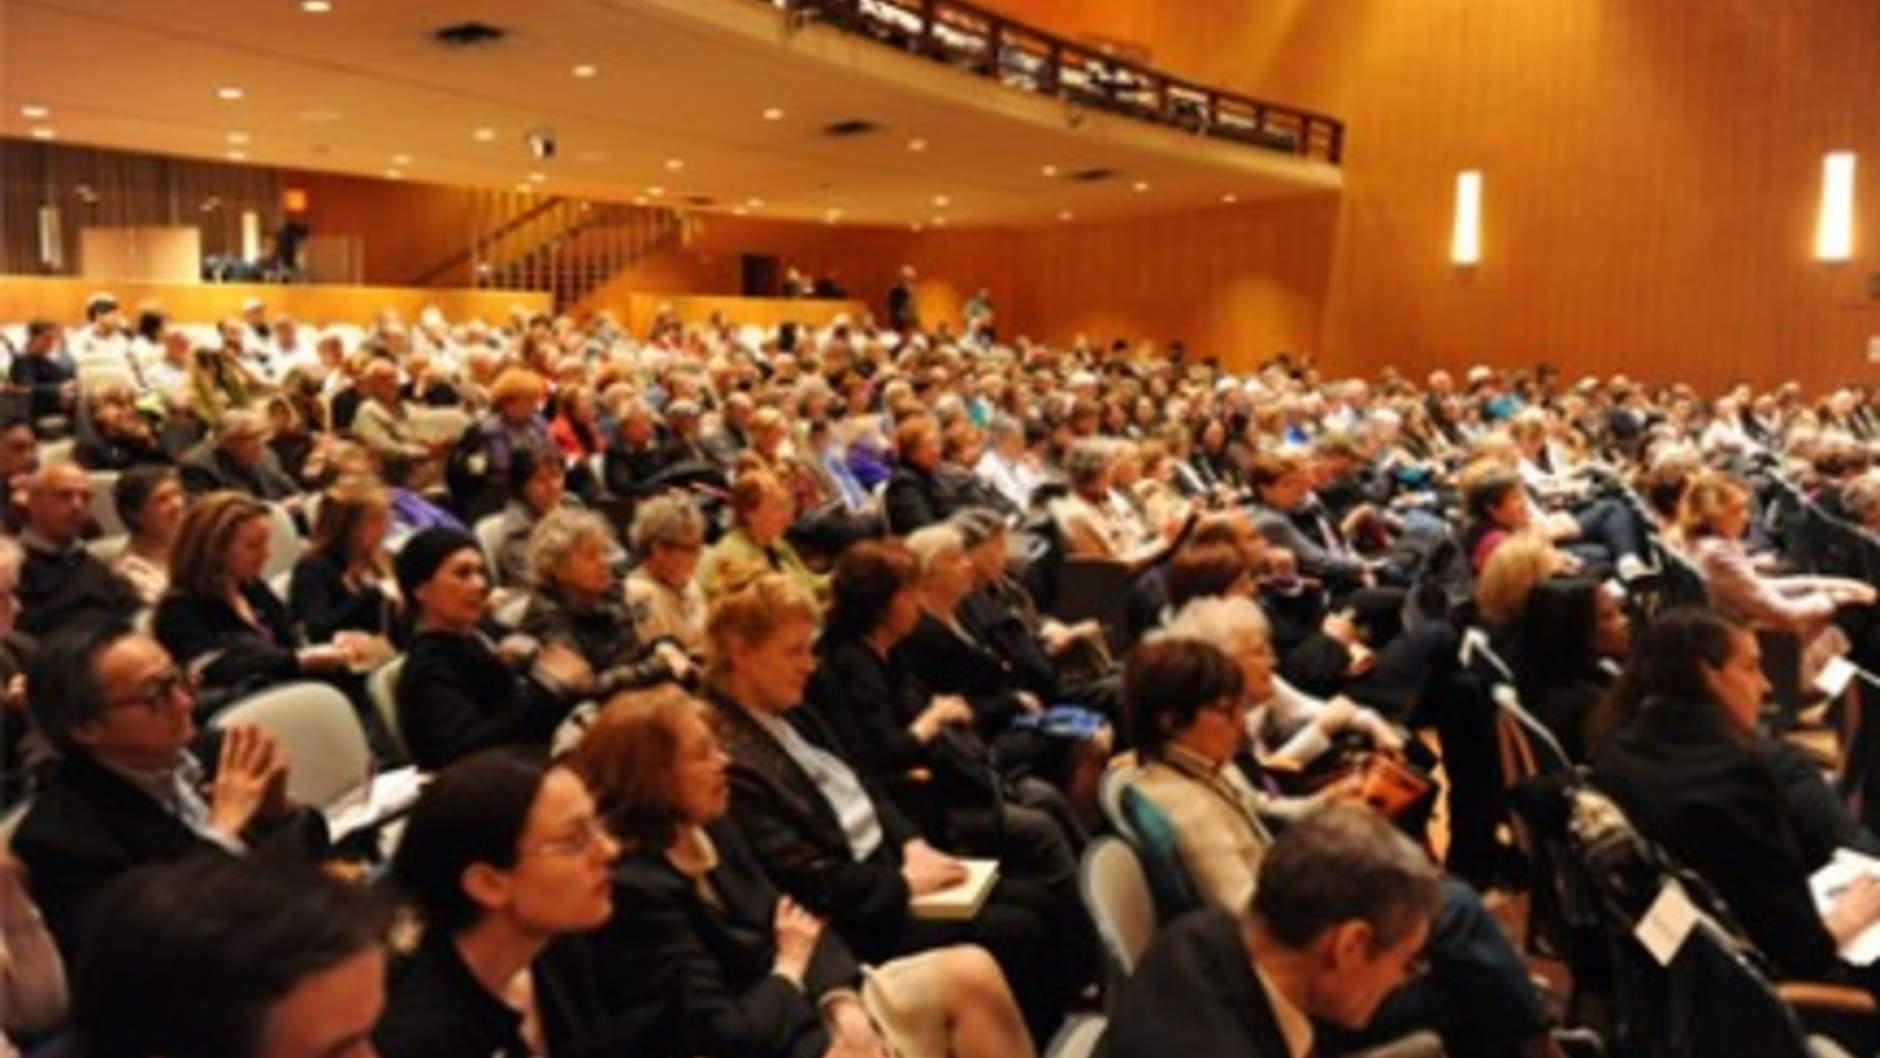 Coexist sponsors lectures at the Metropolitan Museum of Art in New York